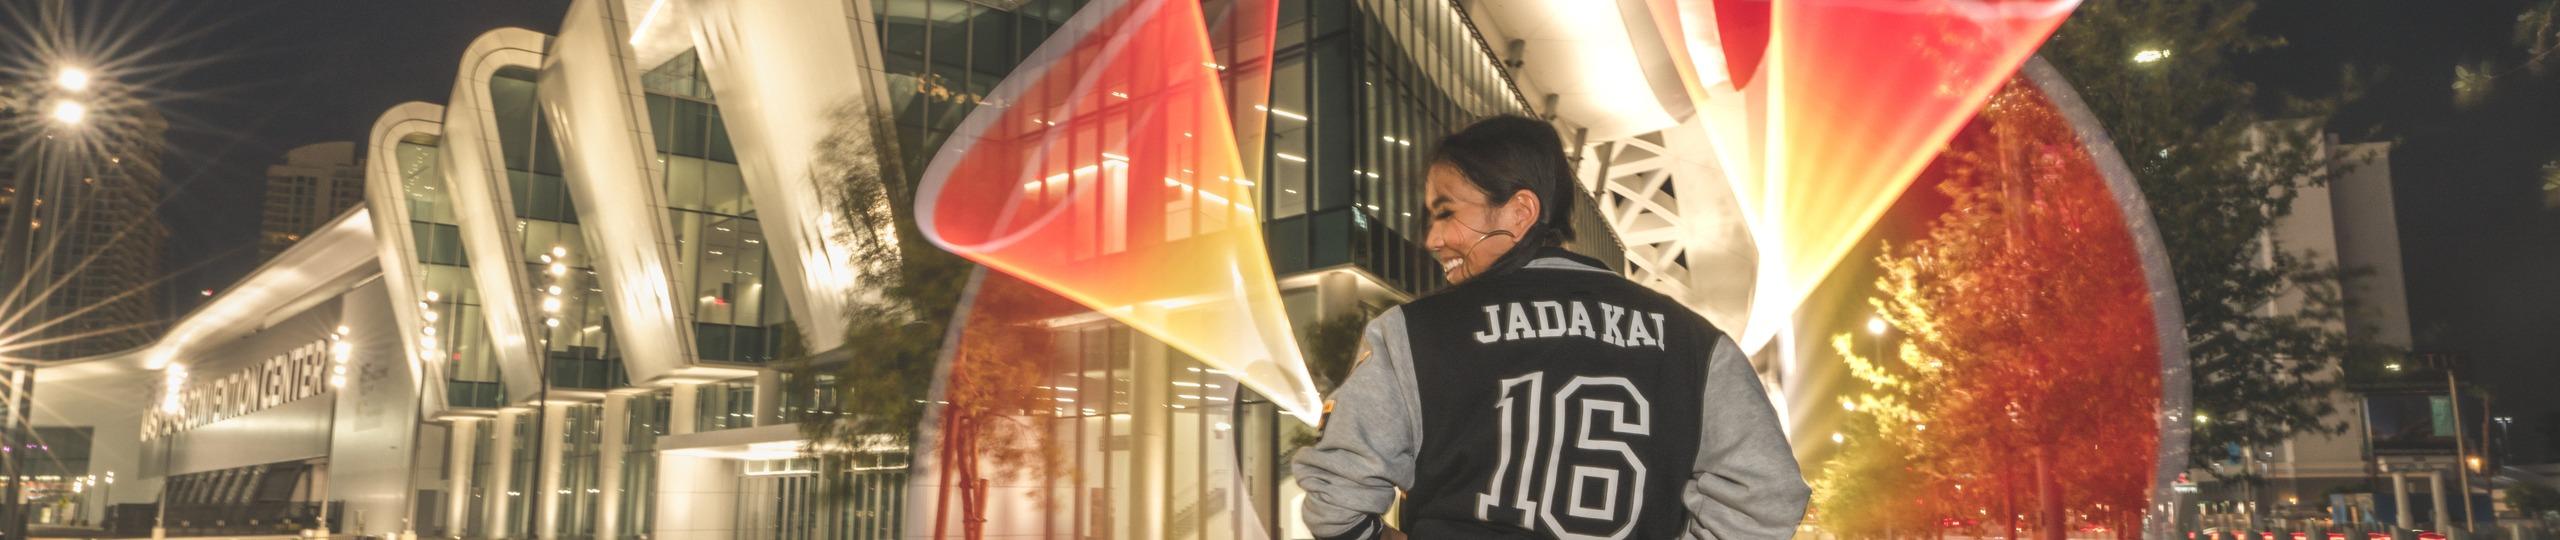 Jada Kai - profile image